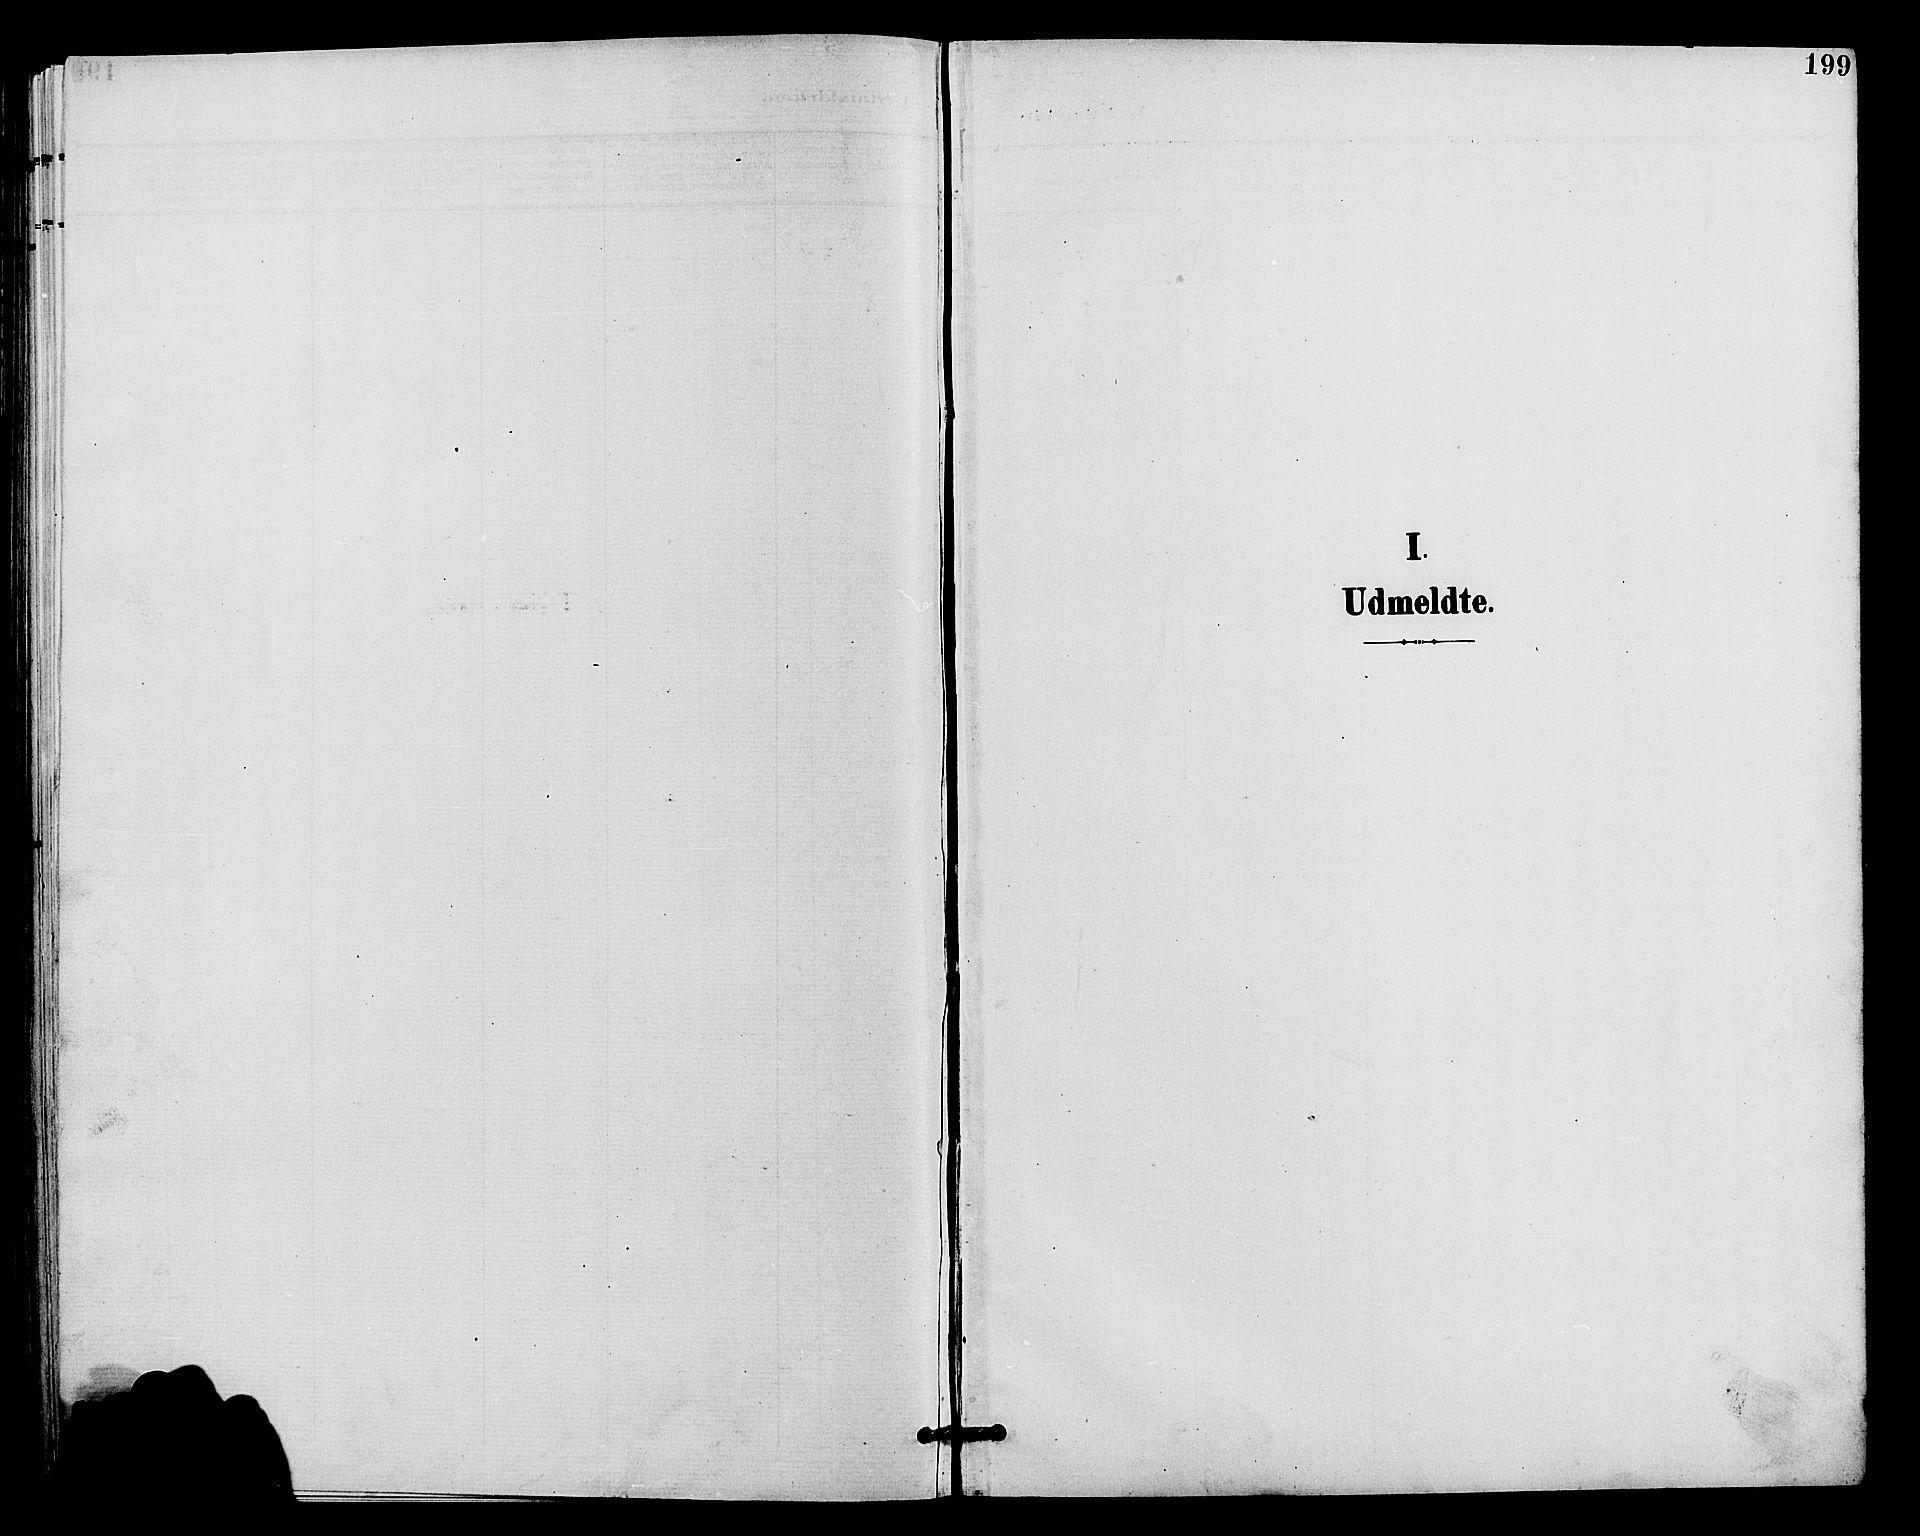 SAH, Vardal prestekontor, H/Ha/Hab/L0011: Klokkerbok nr. 11, 1899-1913, s. 199